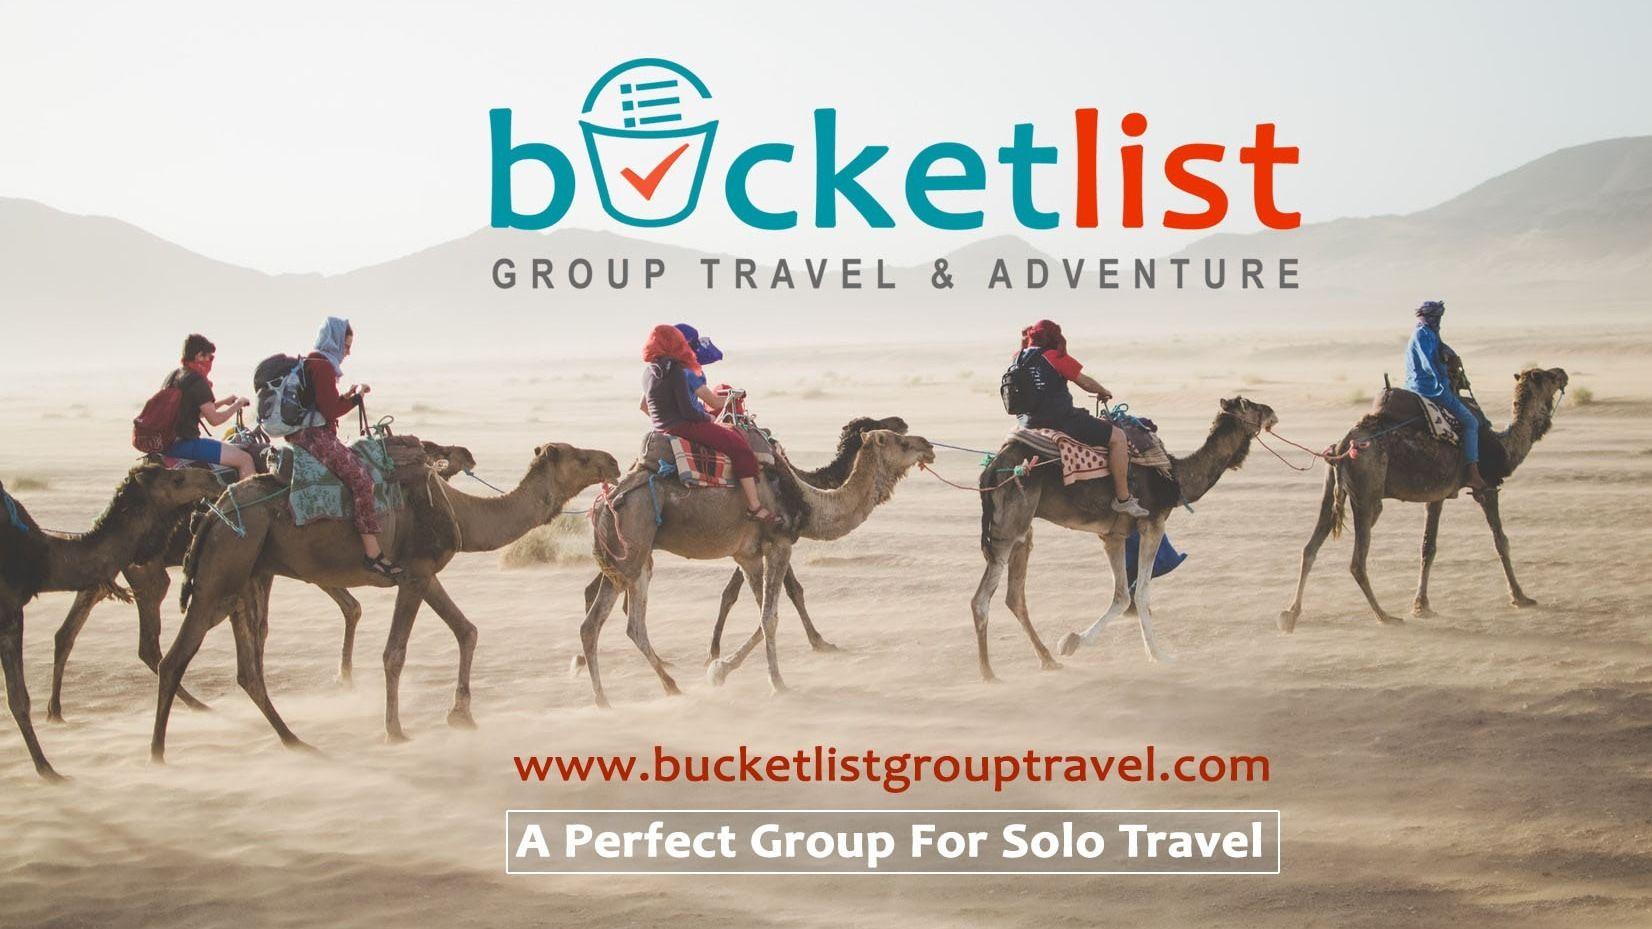 Los Angeles - Bucket List Group Travel